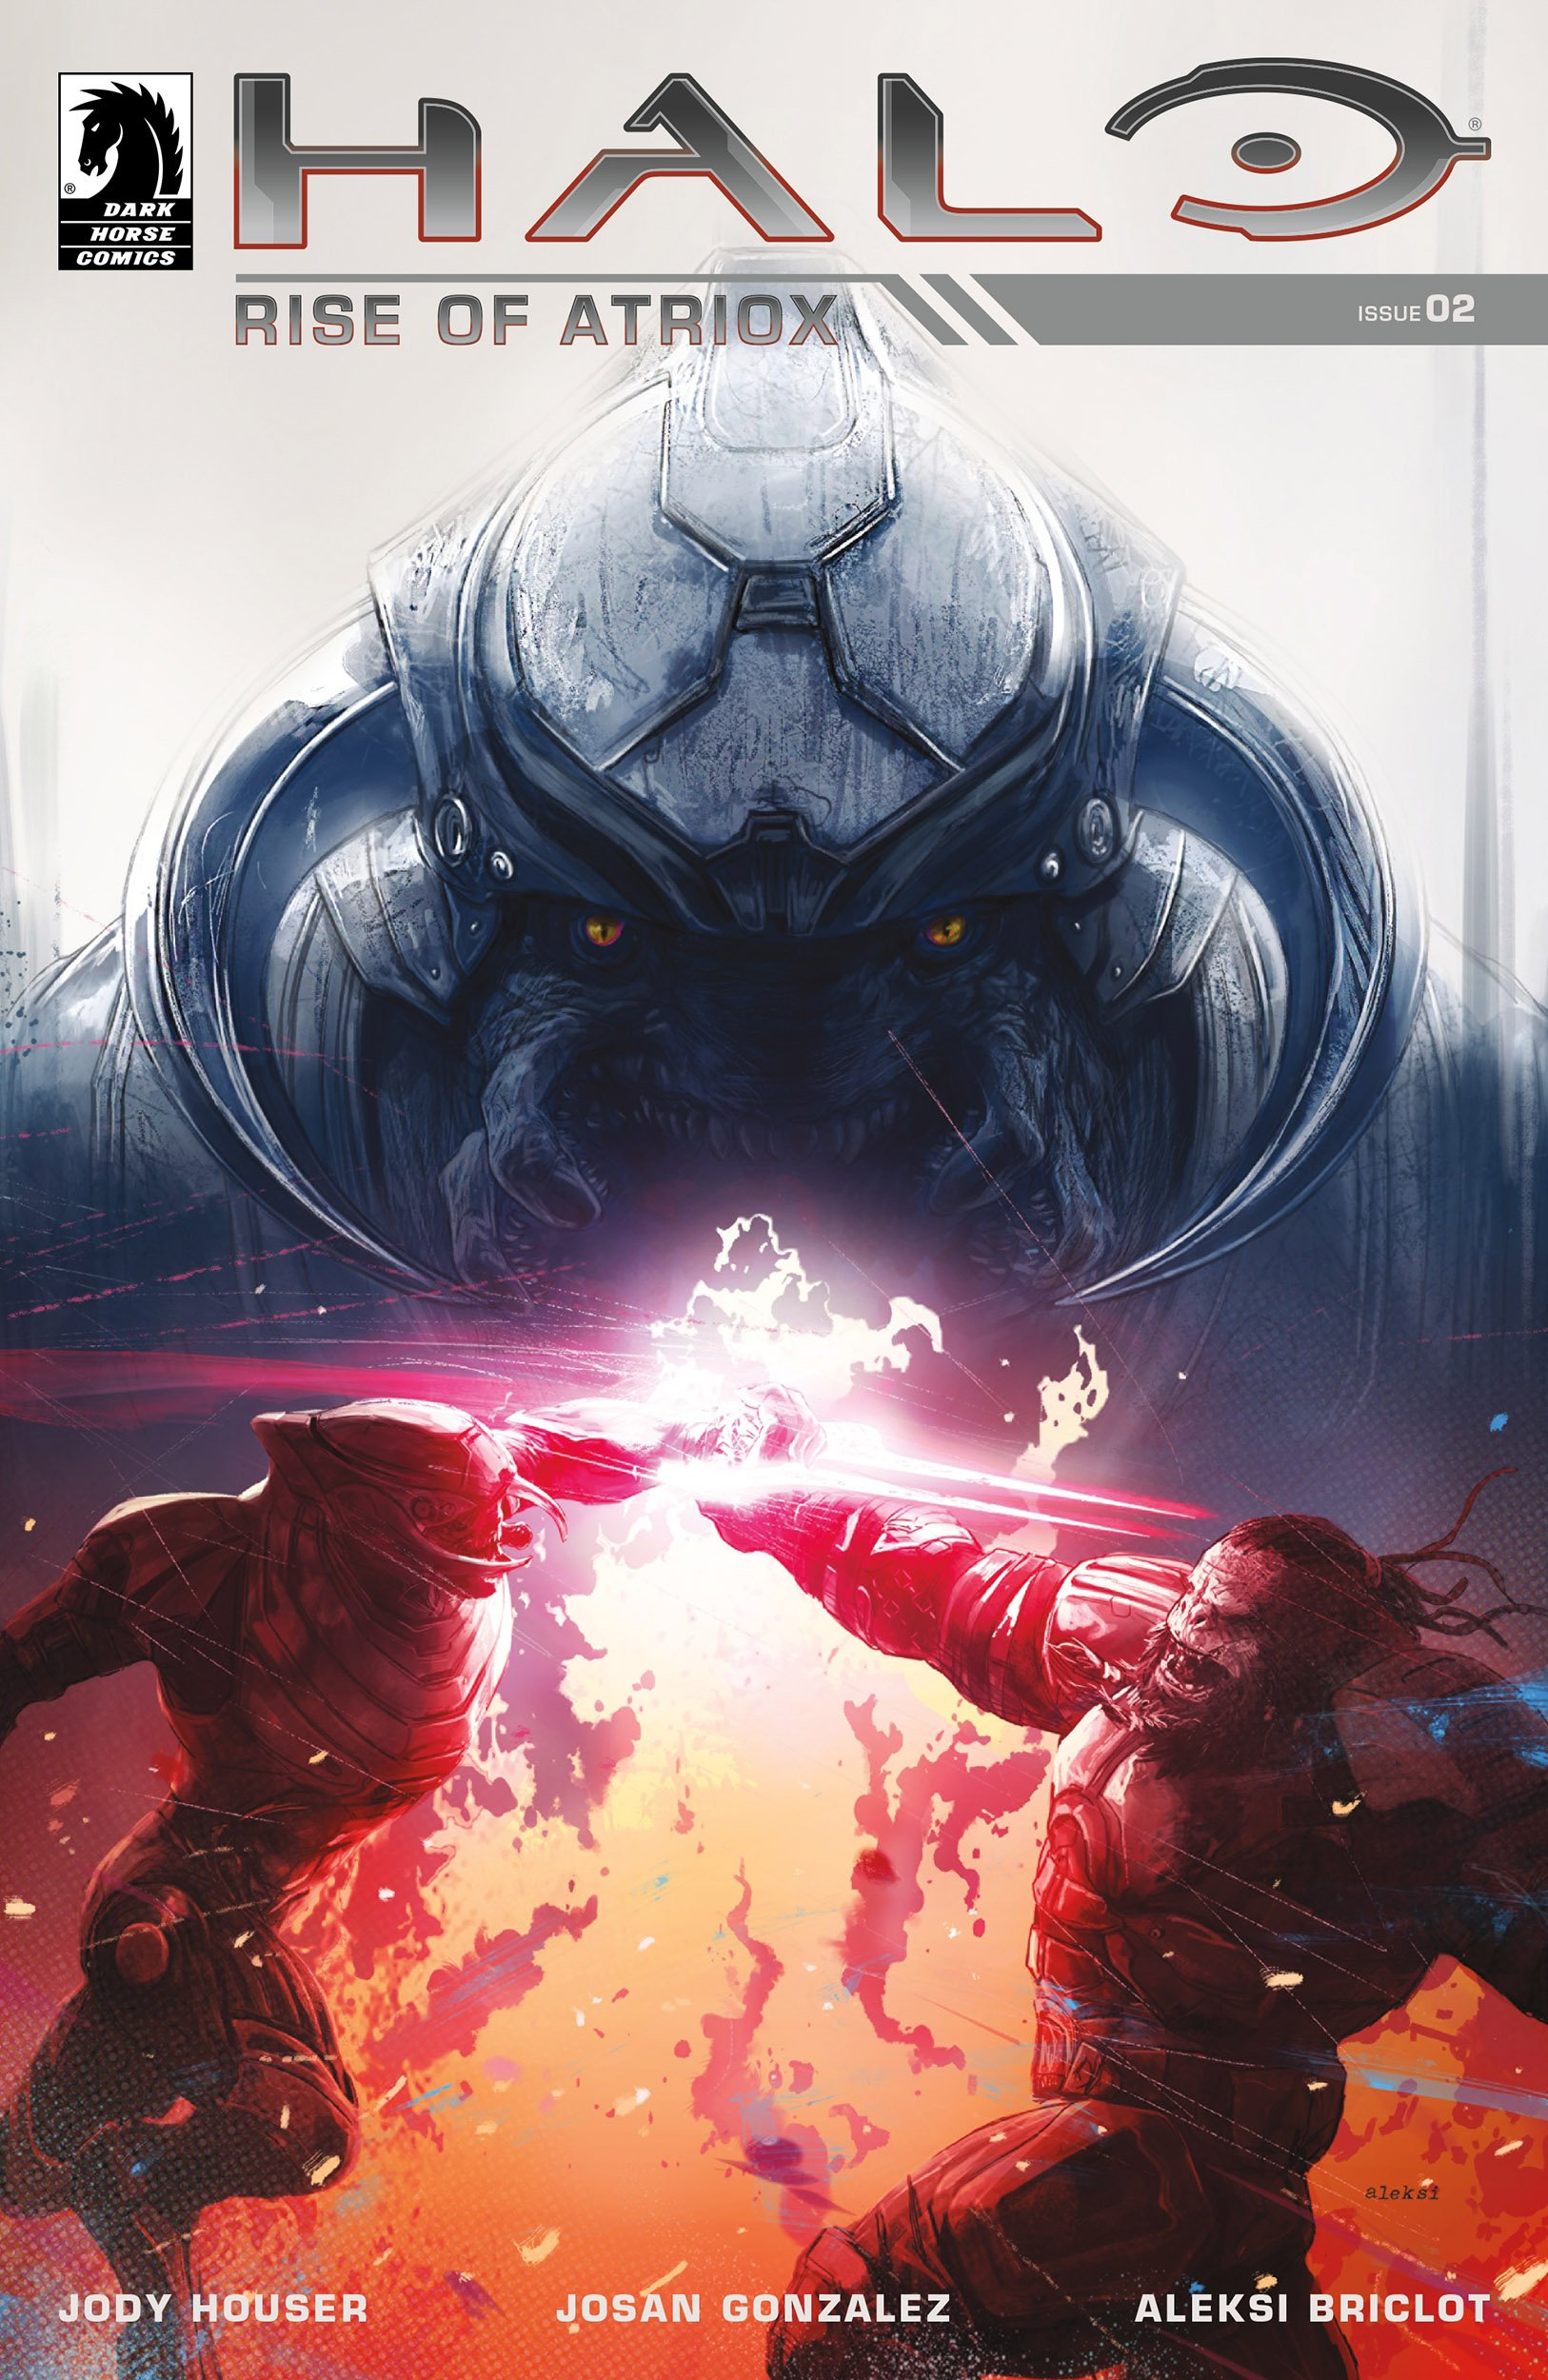 Halo - Rise of Atriox 002 (September 2017)